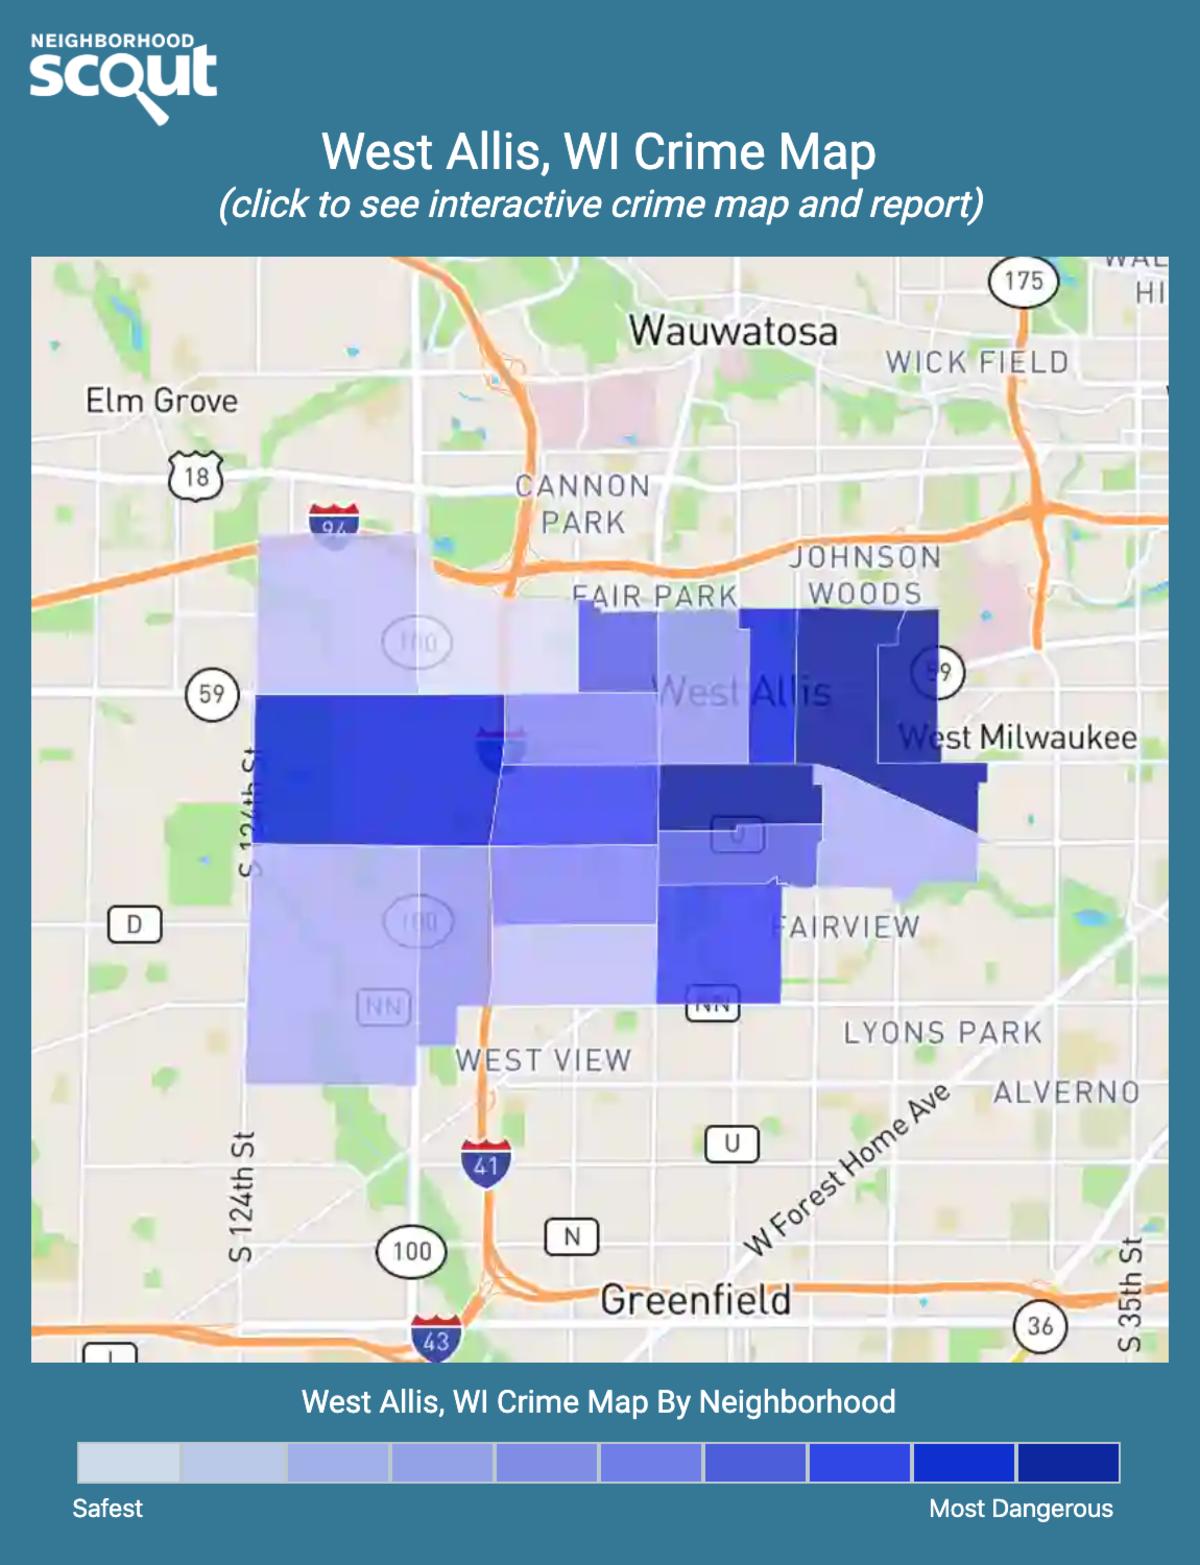 West Allis, Wisconsin crime map